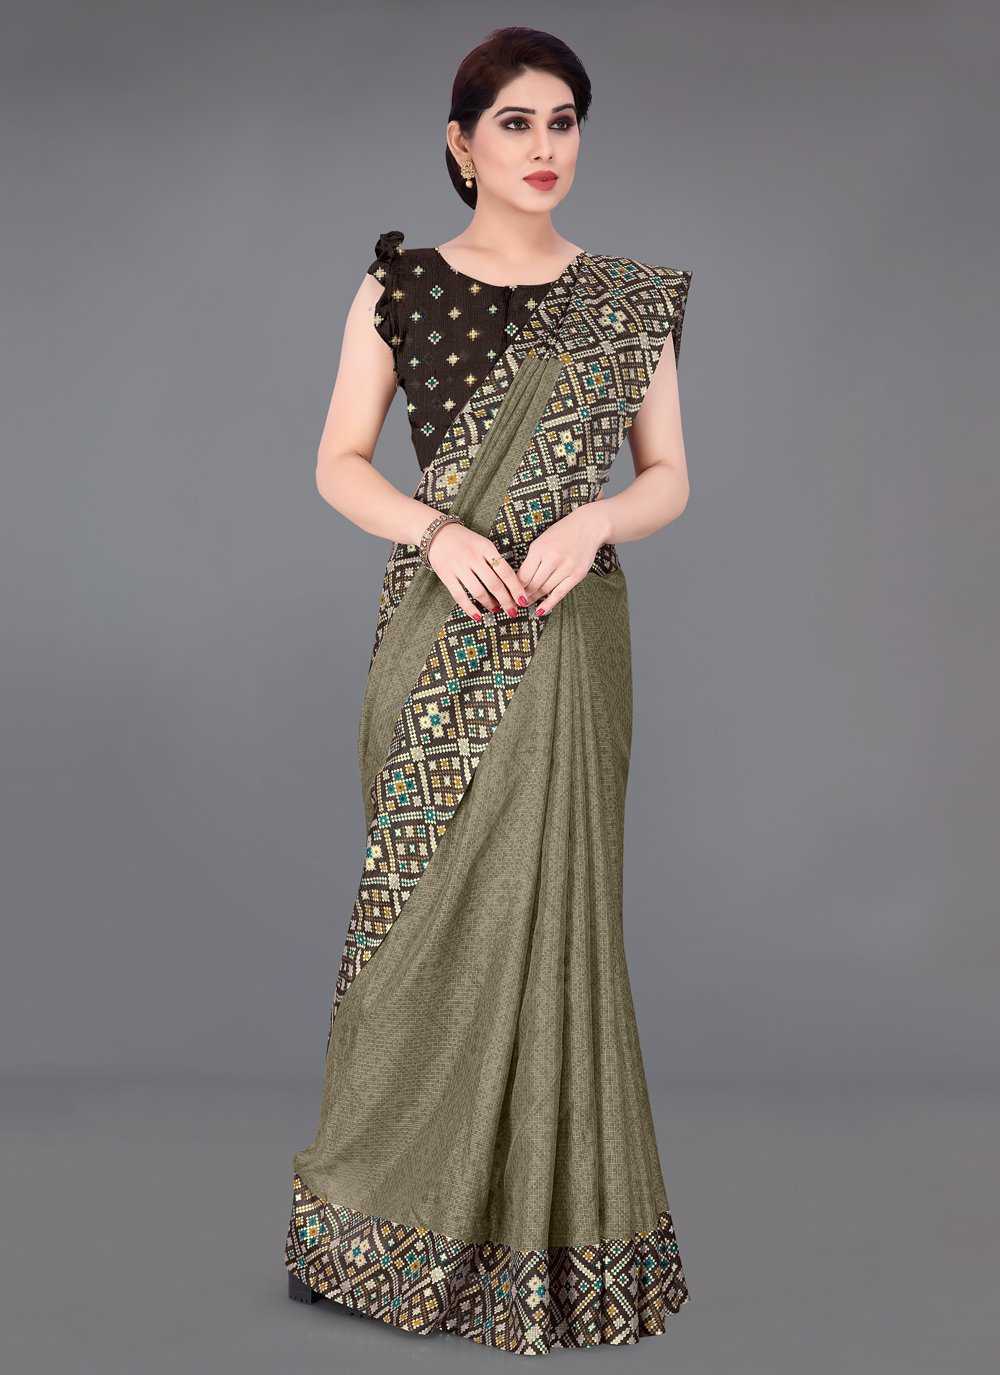 Fancy Fabric Khaki Printed Saree